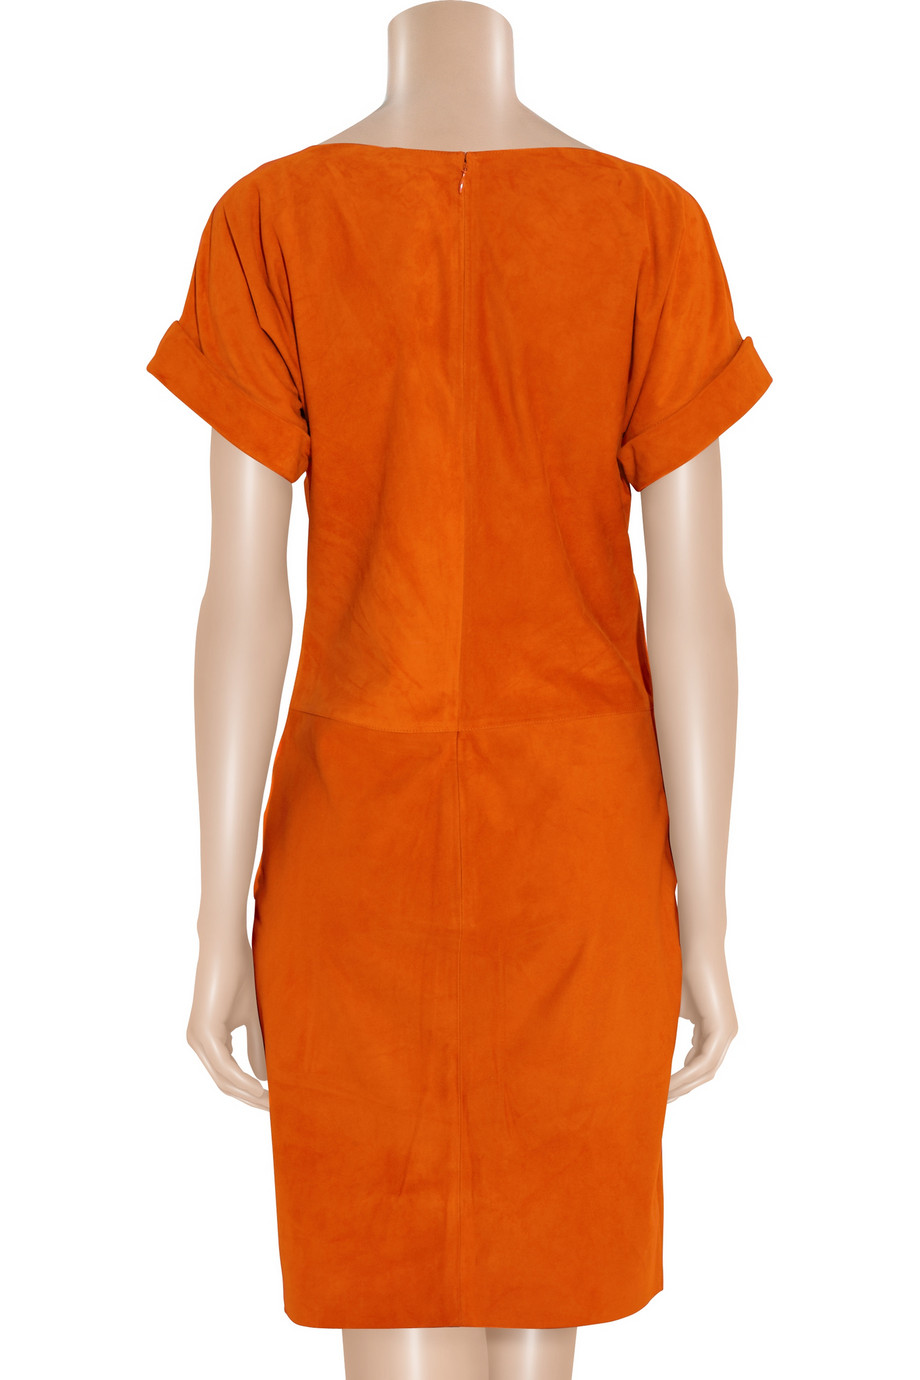 Lyst Ralph Lauren Collection Shiloh Suede Dress In Orange